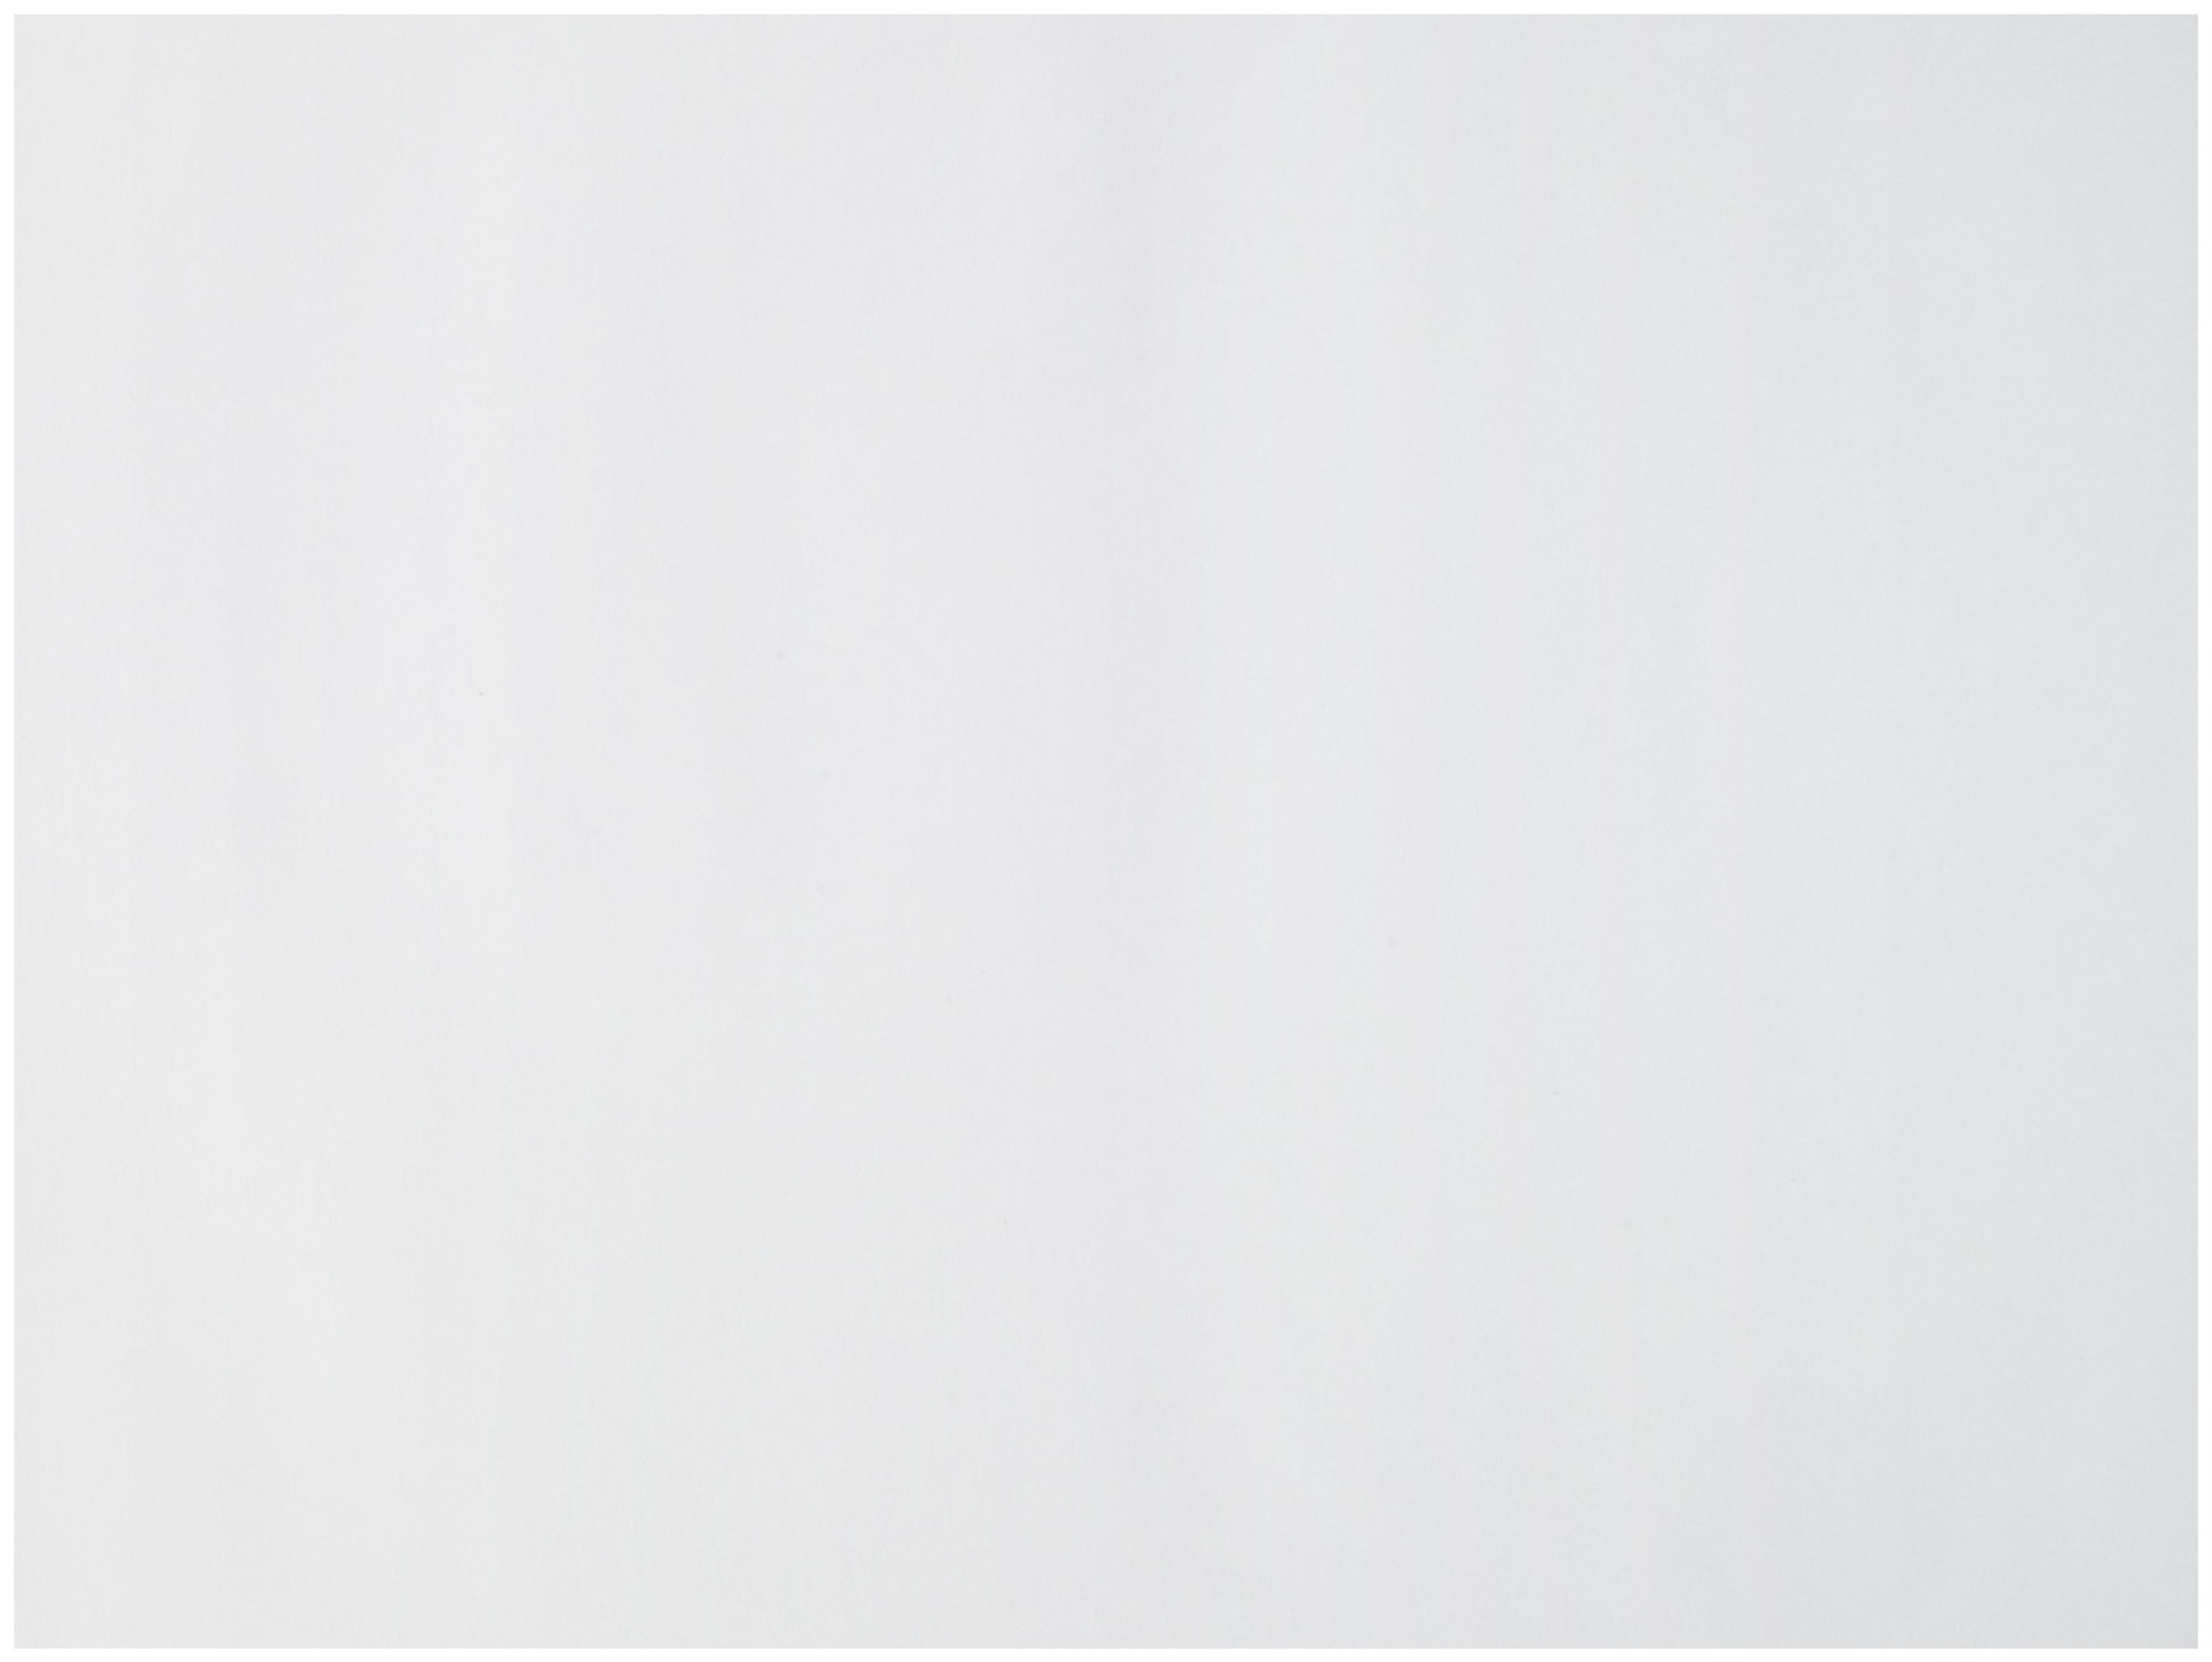 Whatman 1441-917 Ashless Quantitative Filter Paper Sheet, 46cm Length x 57cm Width, 20 Micron, Grade 41 (Pack of 100)